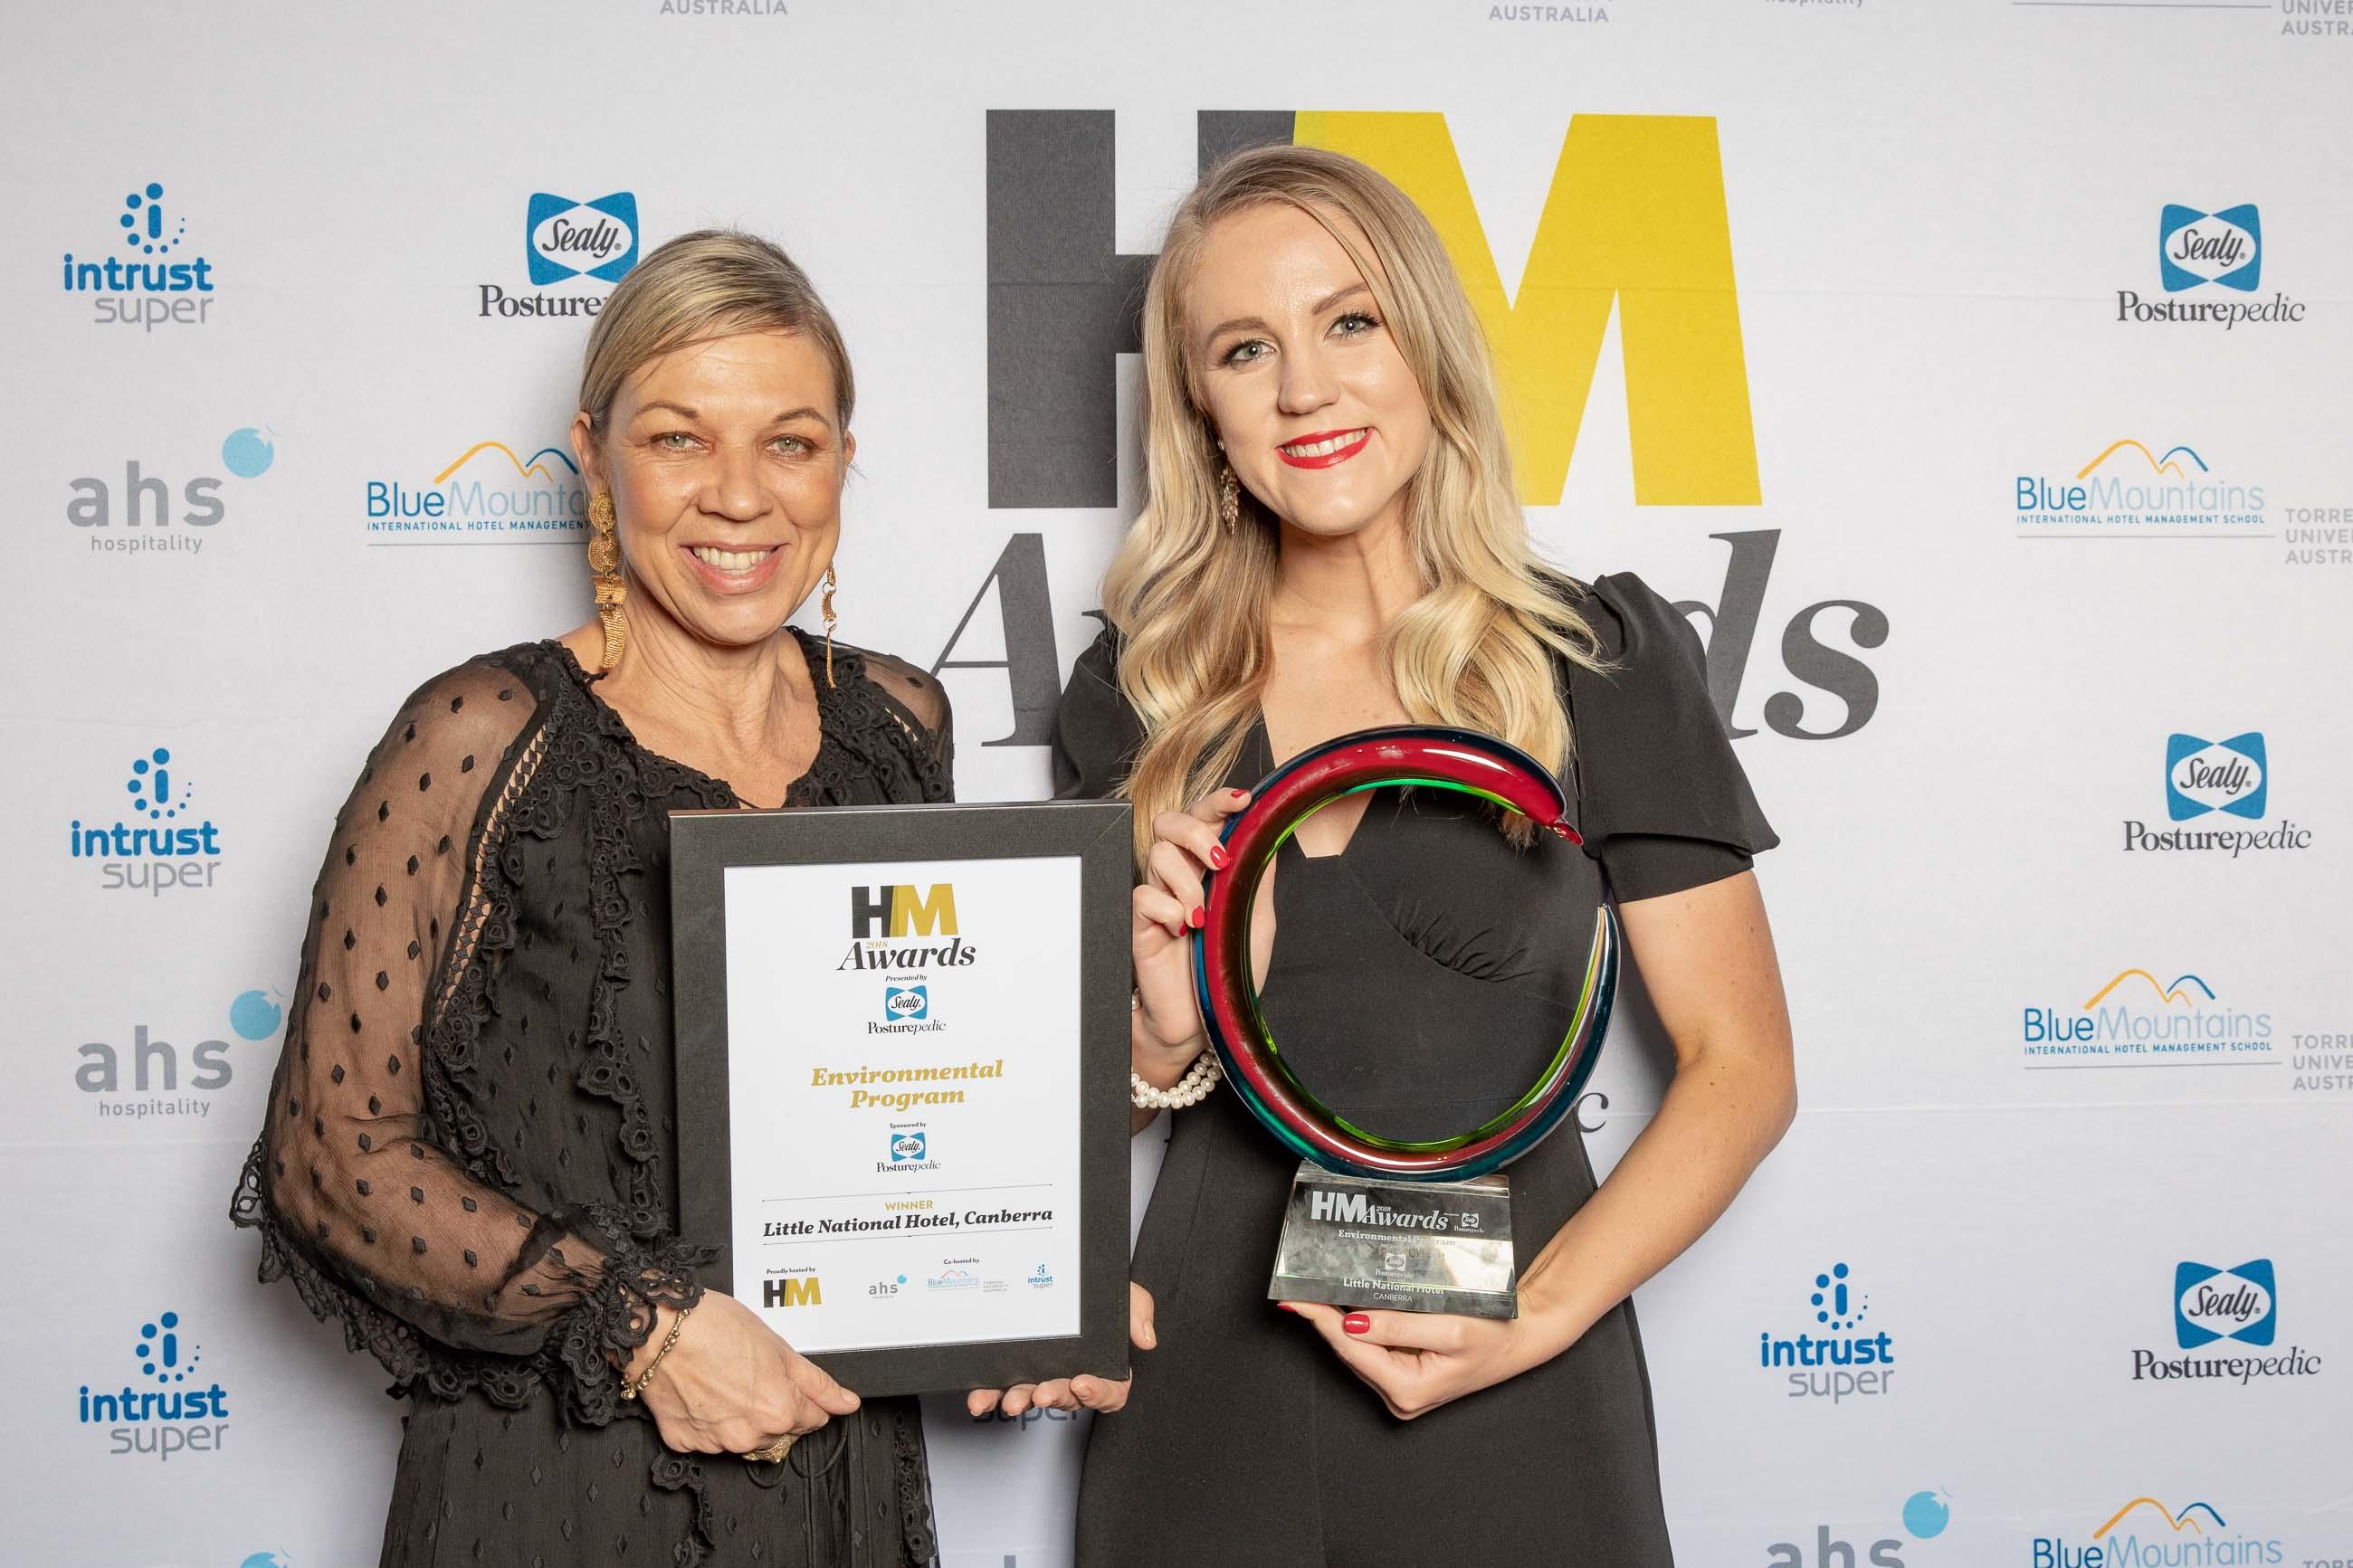 72ppi-HMawards-2018-official-award-wall-252252